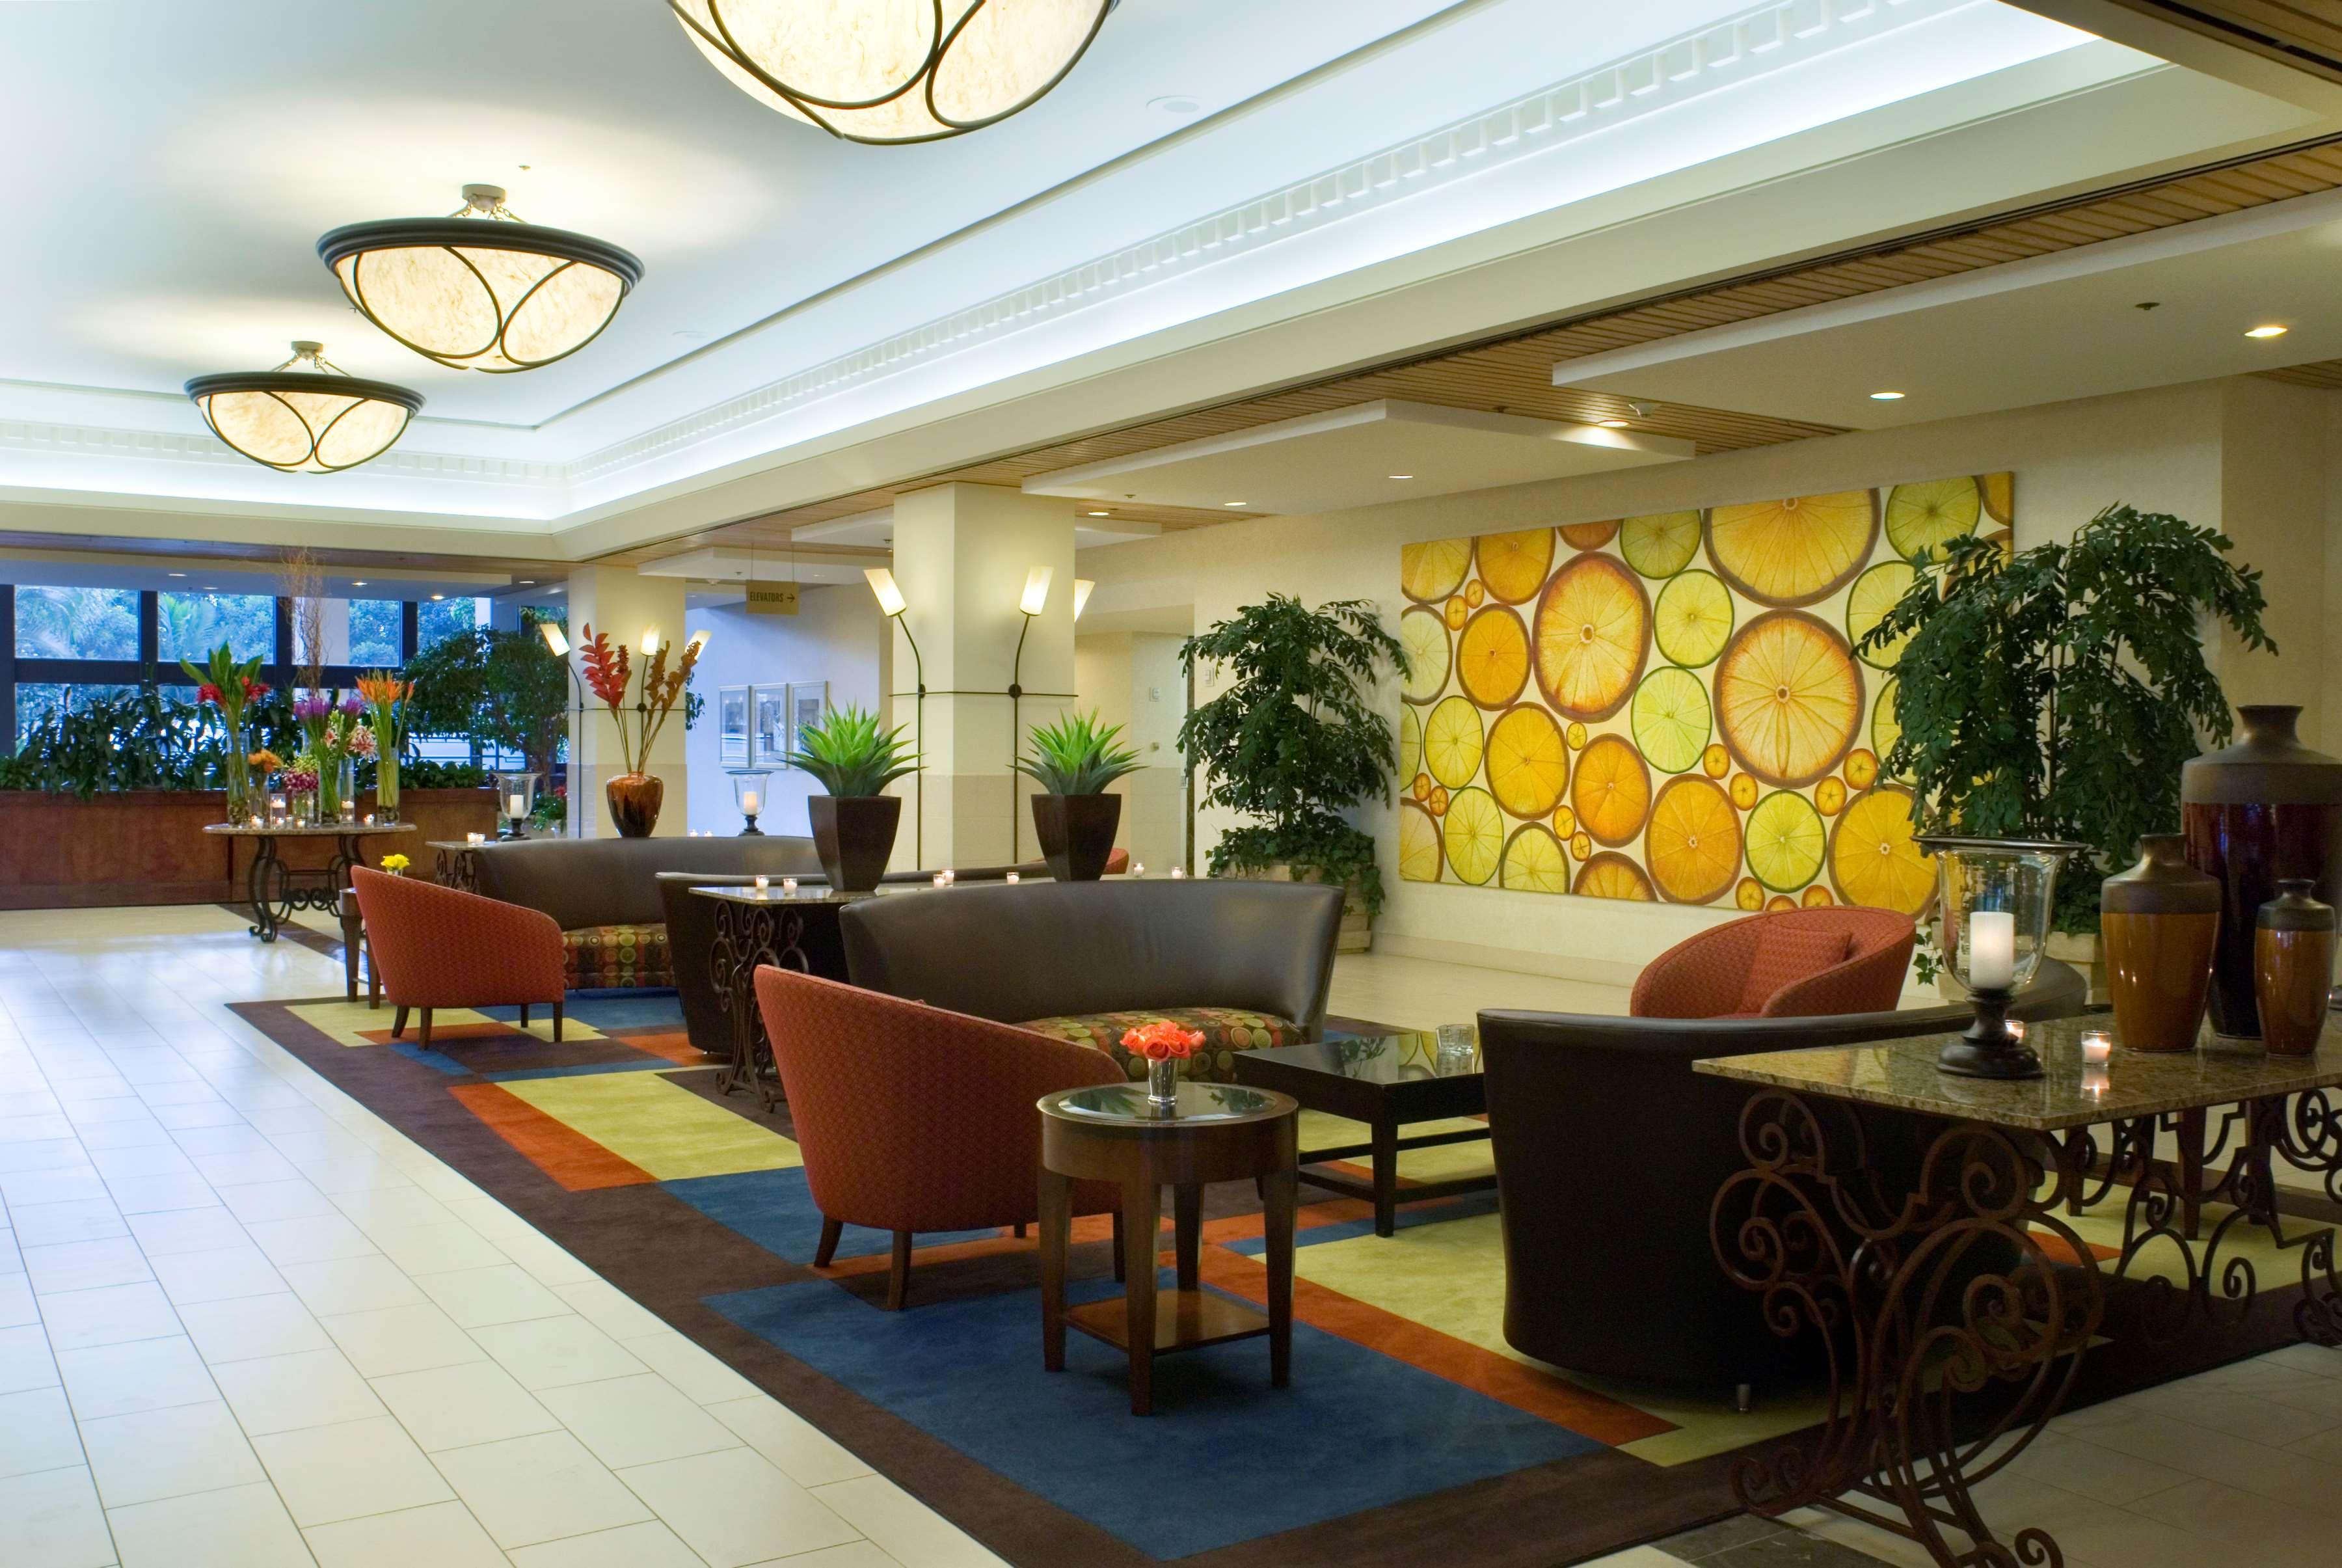 DoubleTree by Hilton Hotel Anaheim - Orange County image 11